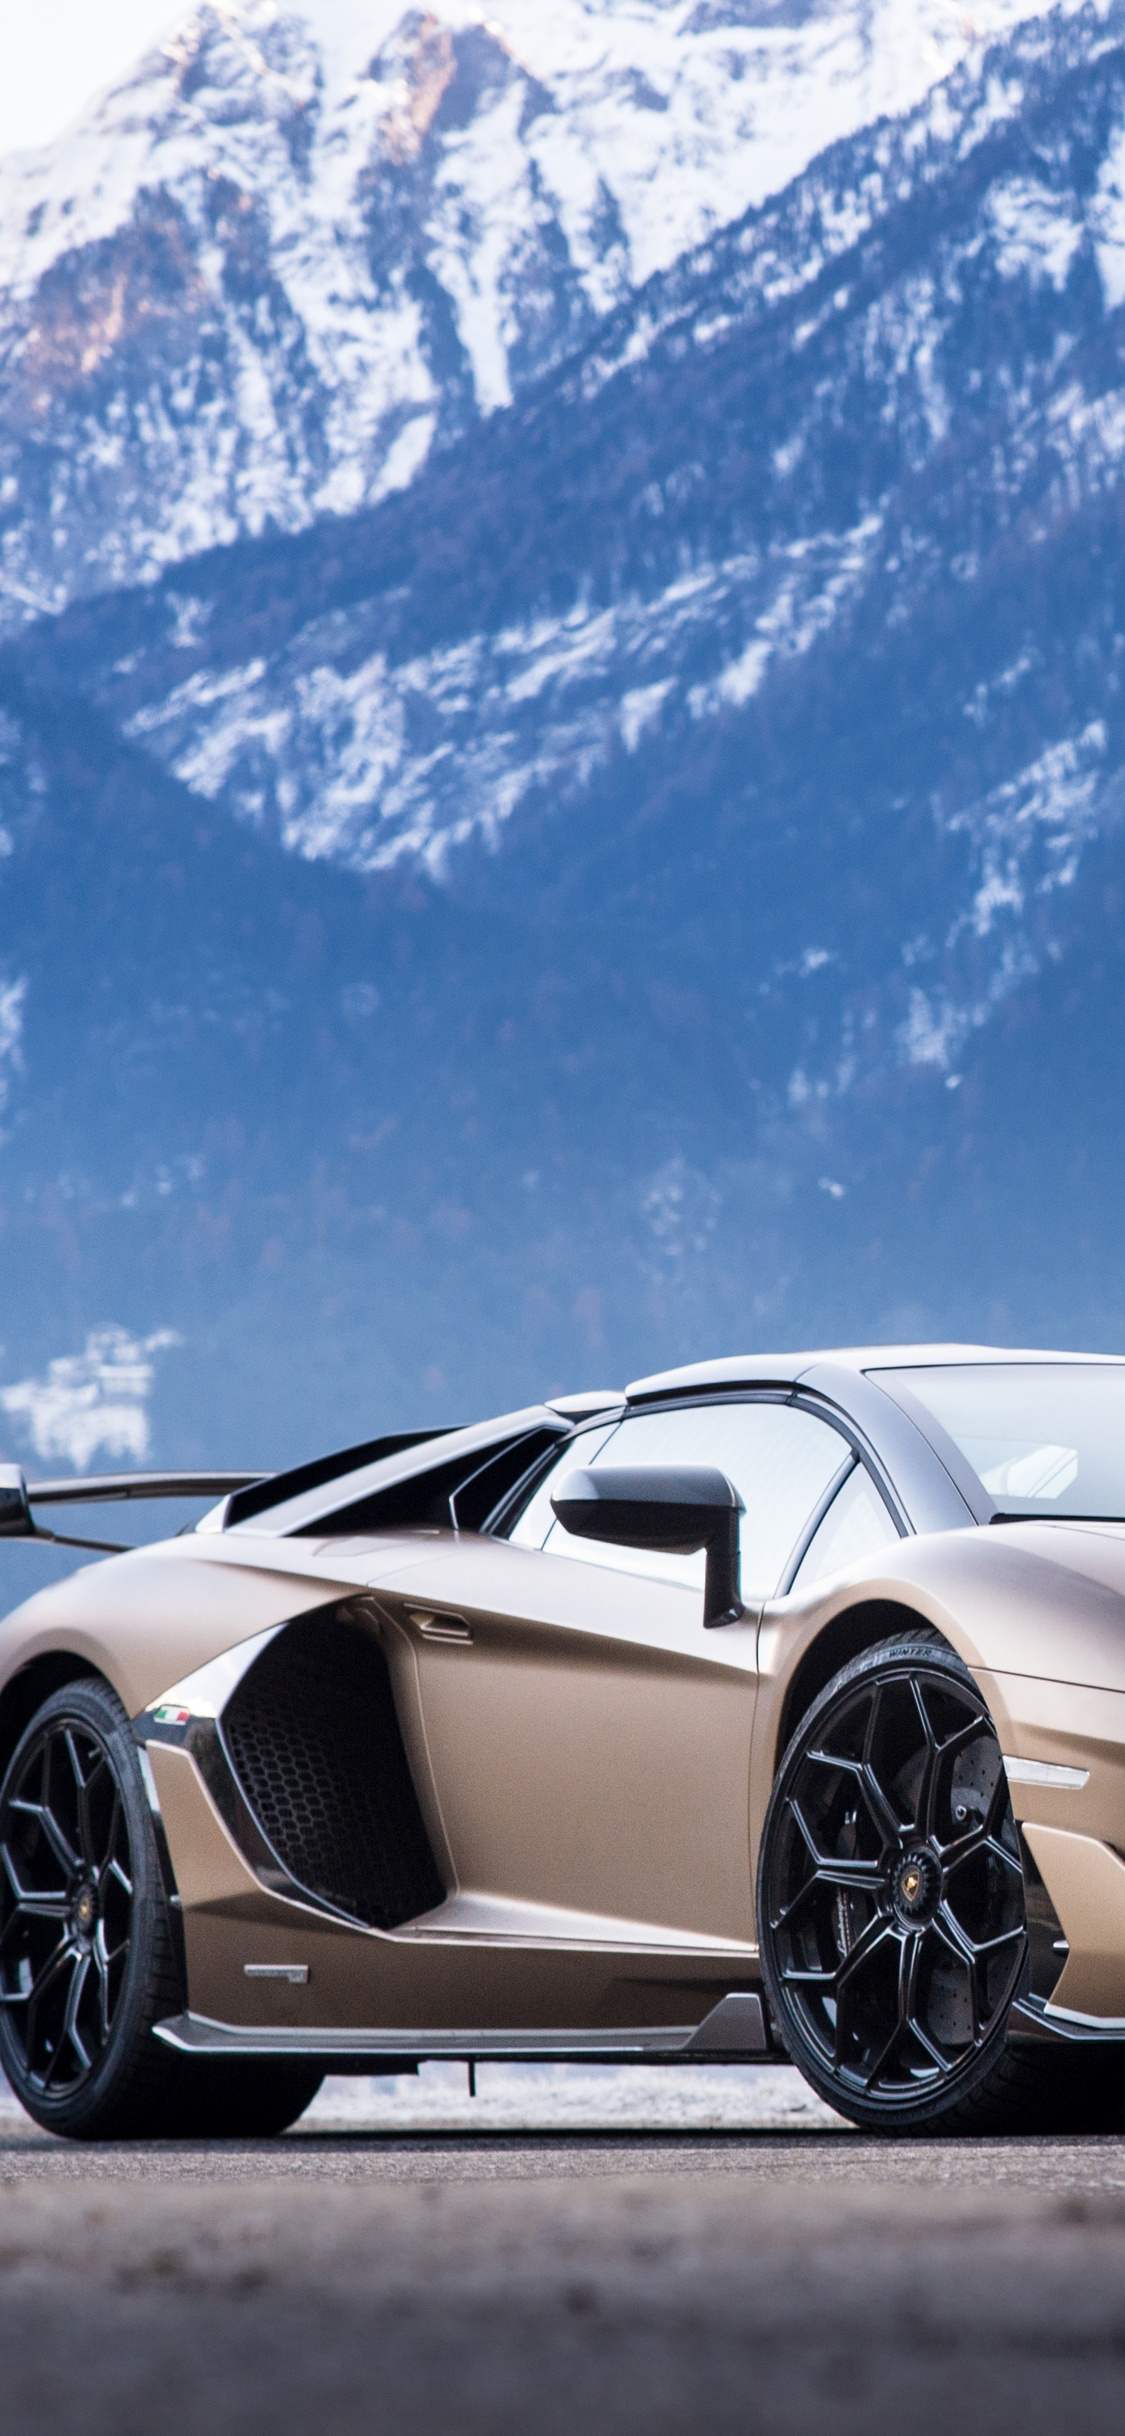 lamborghini-aventador-svj-roadster-2019-new-tl.jpg